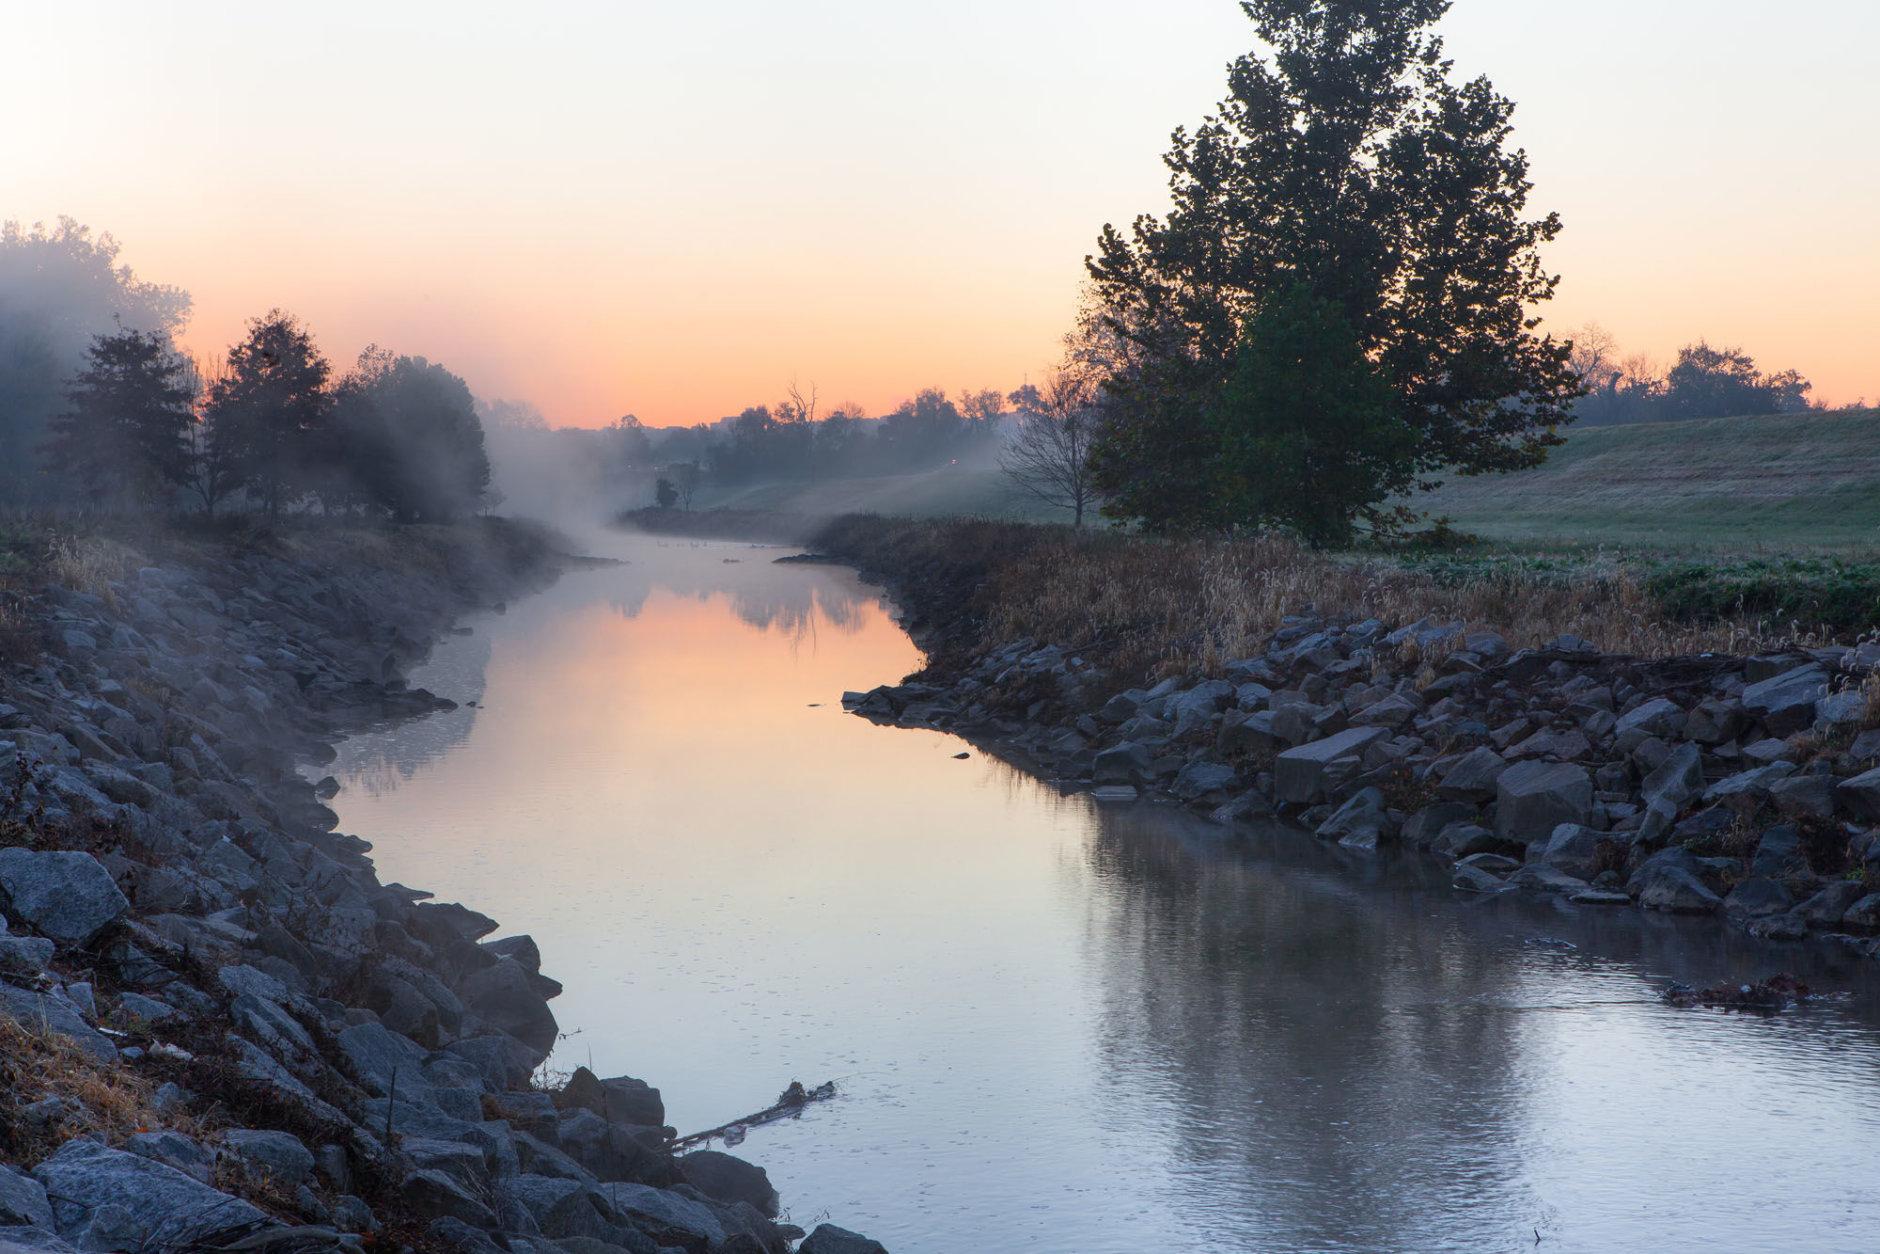 anacostia river